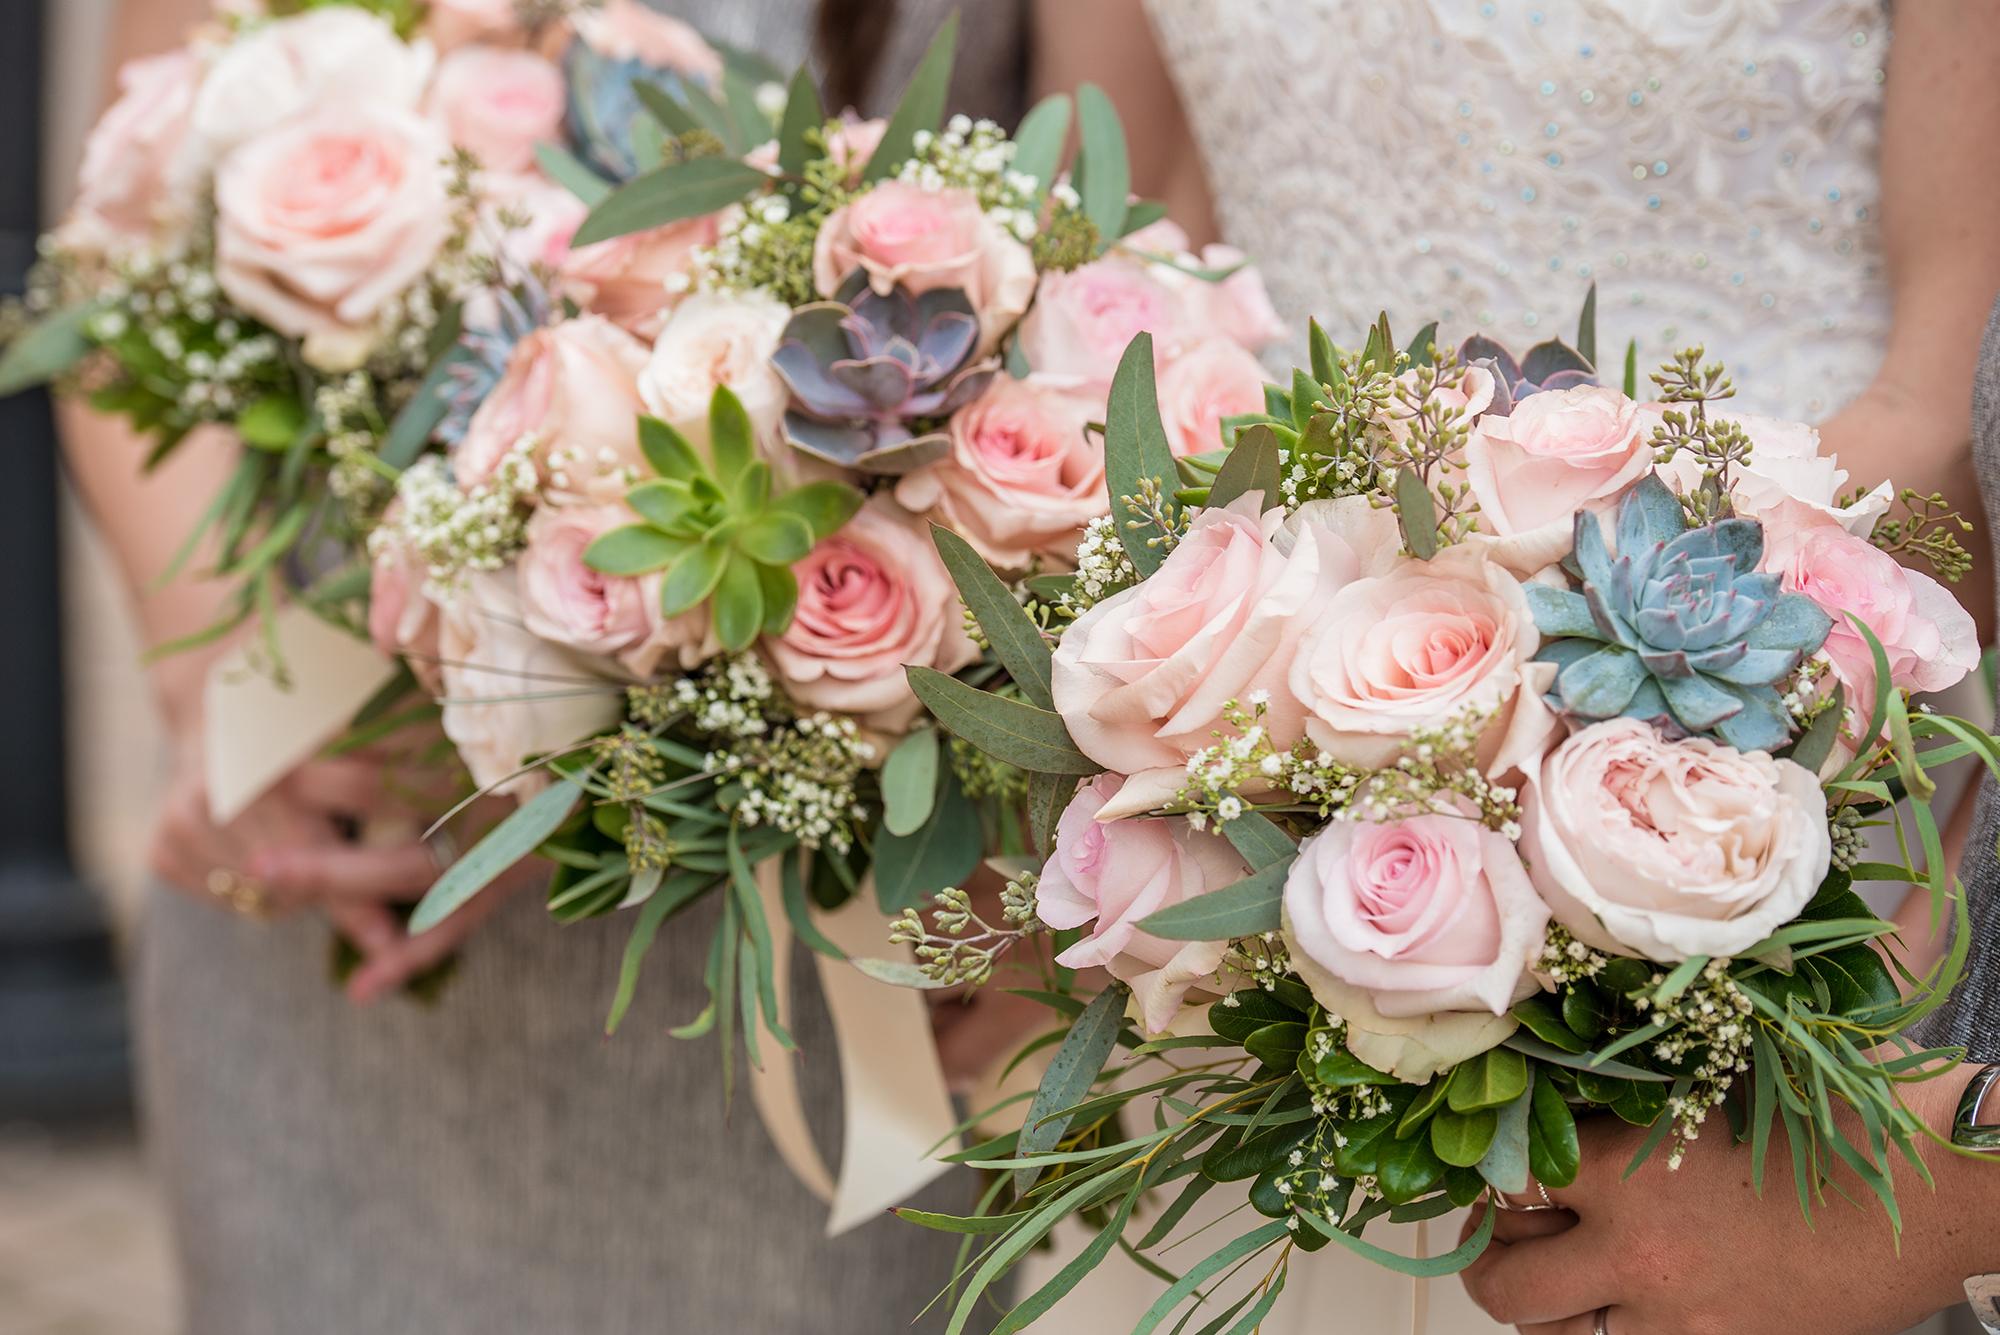 trenos-wedding-lbi-photographer-7.jpg